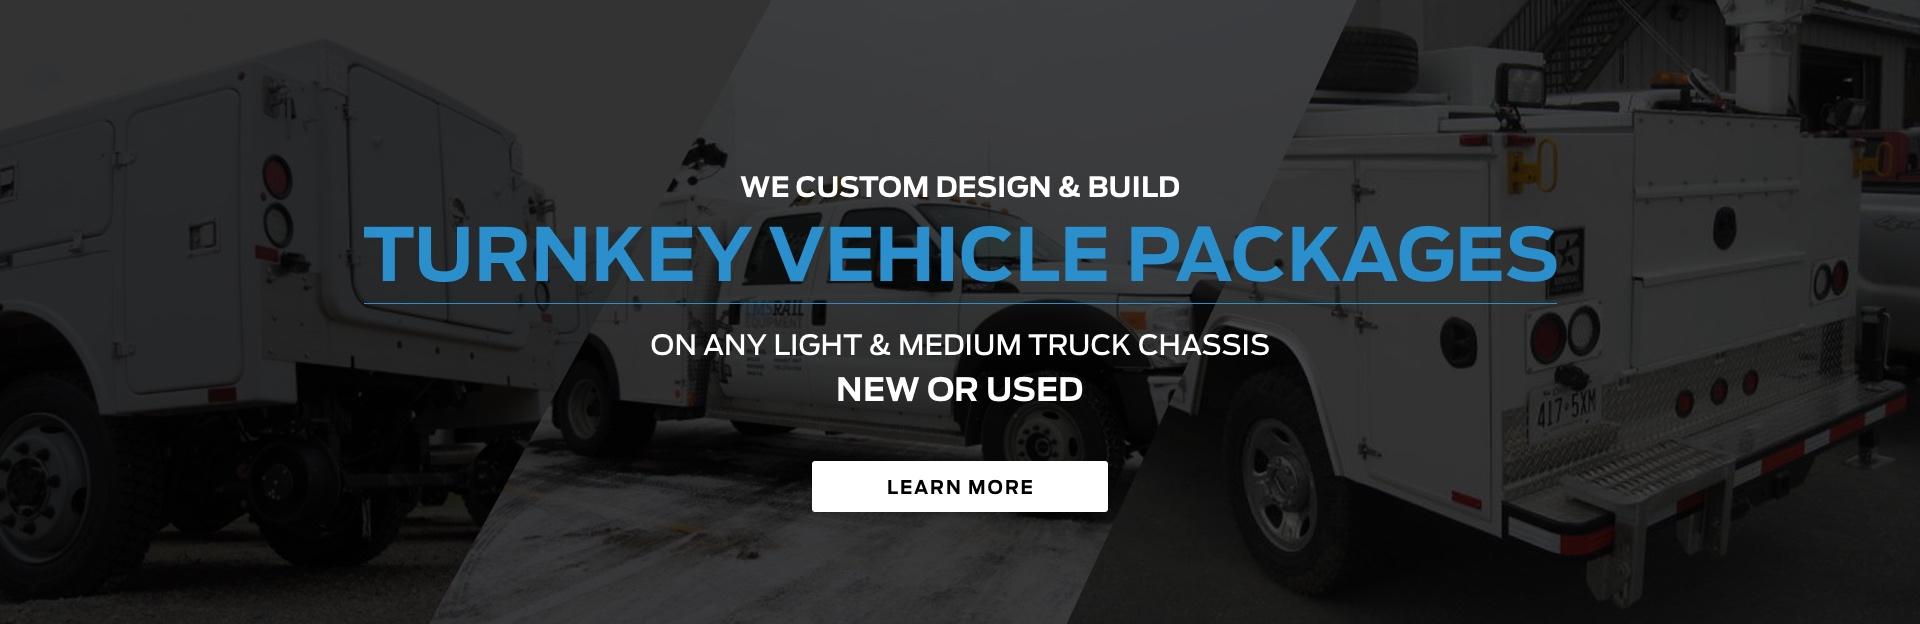 Turnkey Vehicle Package